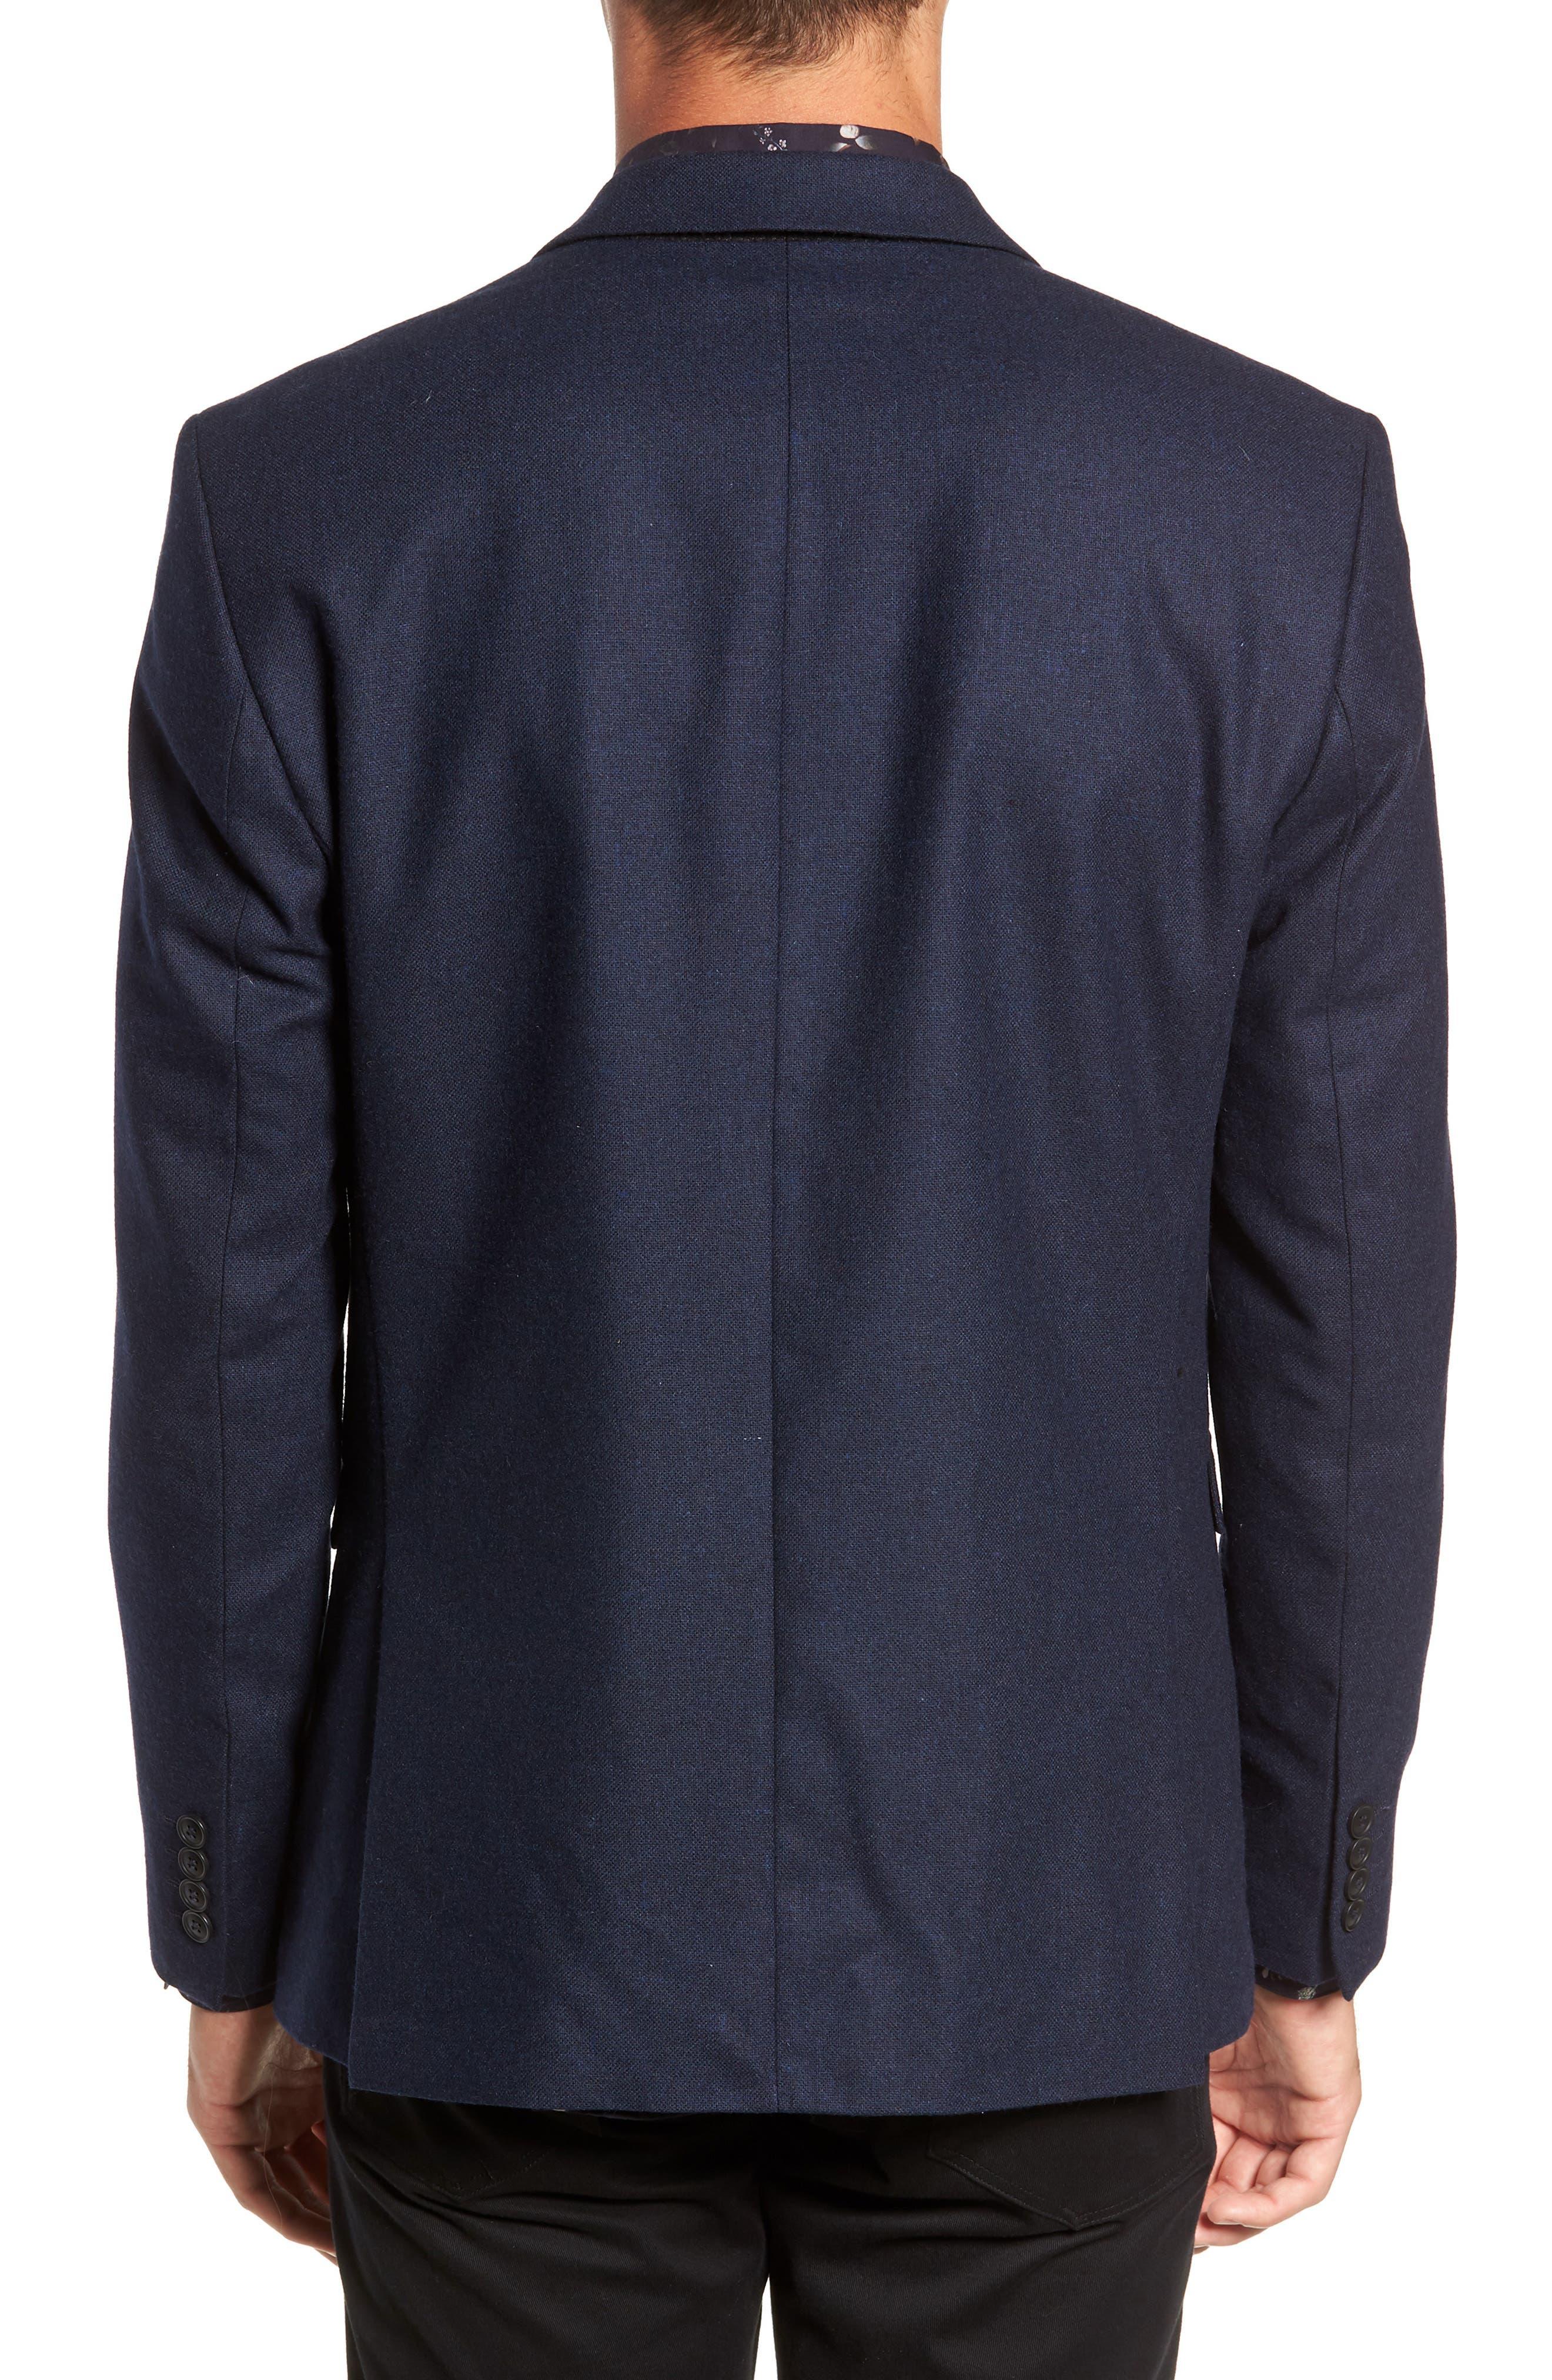 Myloiver Slim Fit Wool Blend Blazer,                             Alternate thumbnail 2, color,                             DARK NAVY